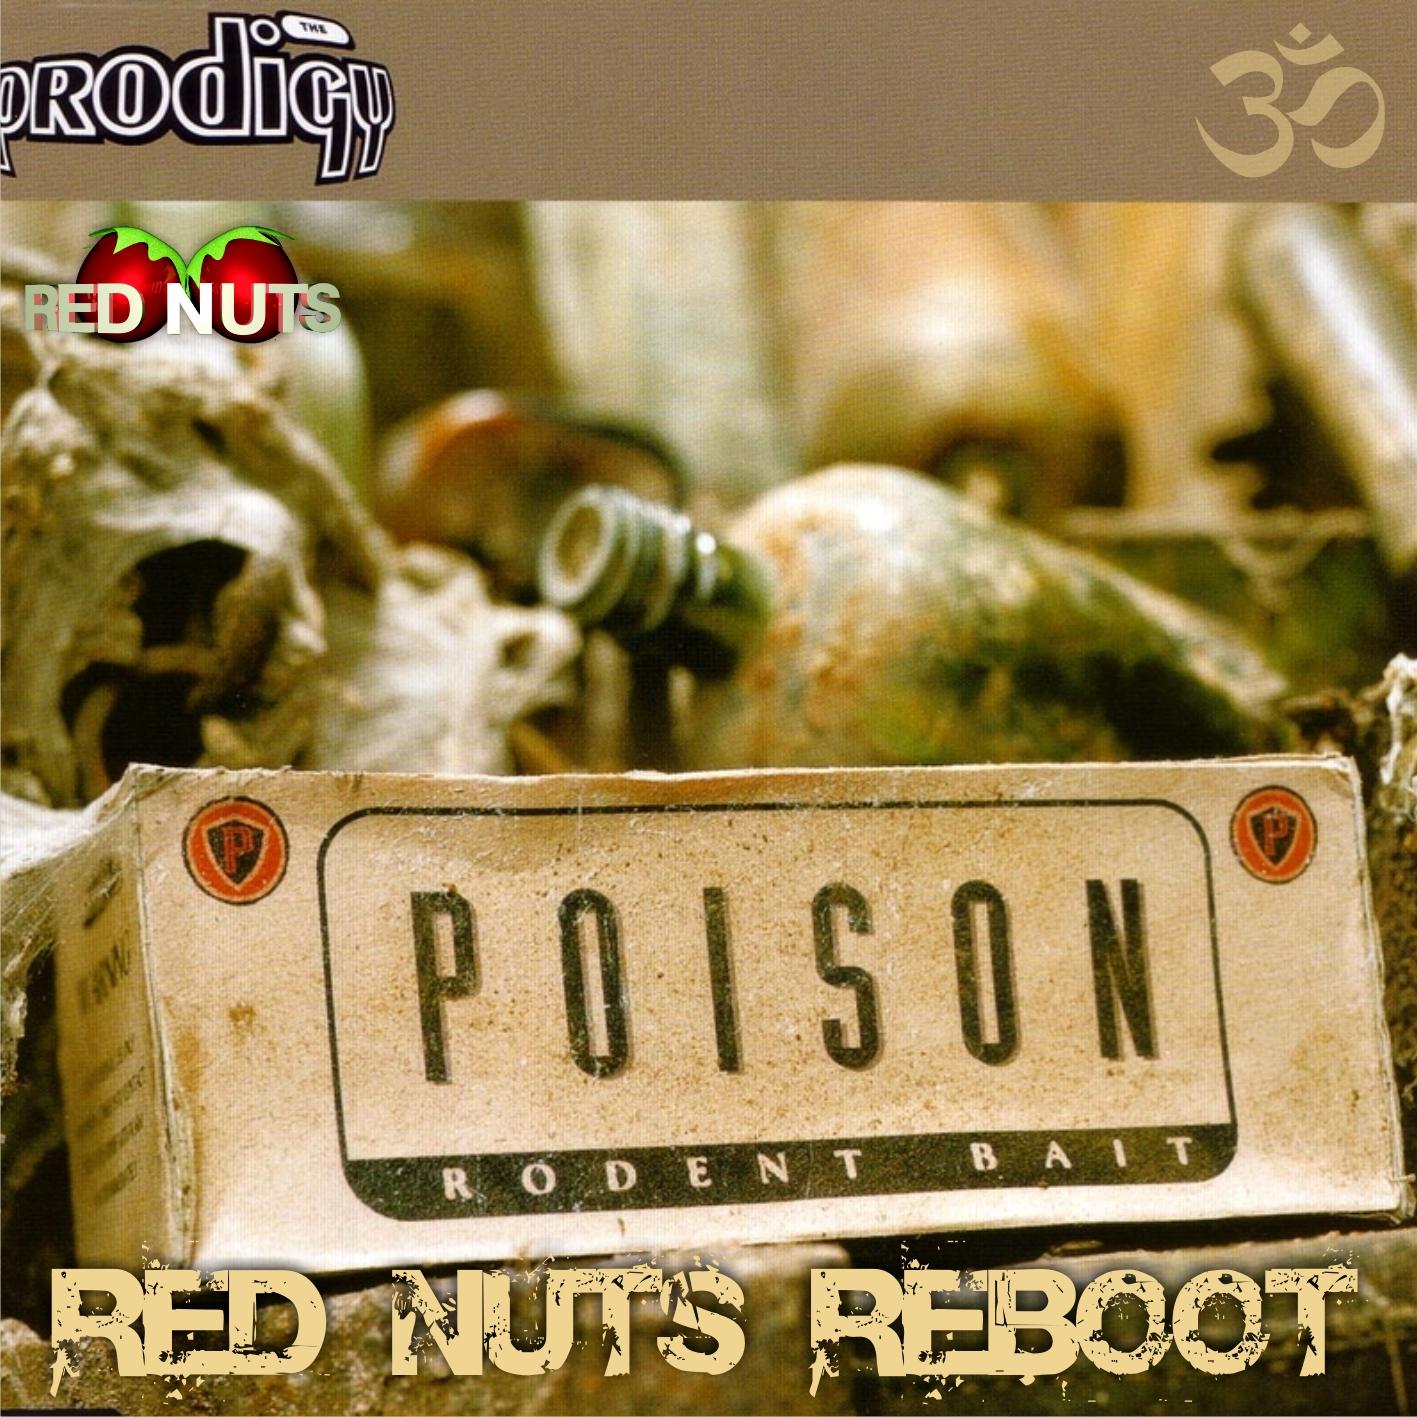 Prodigy Poison